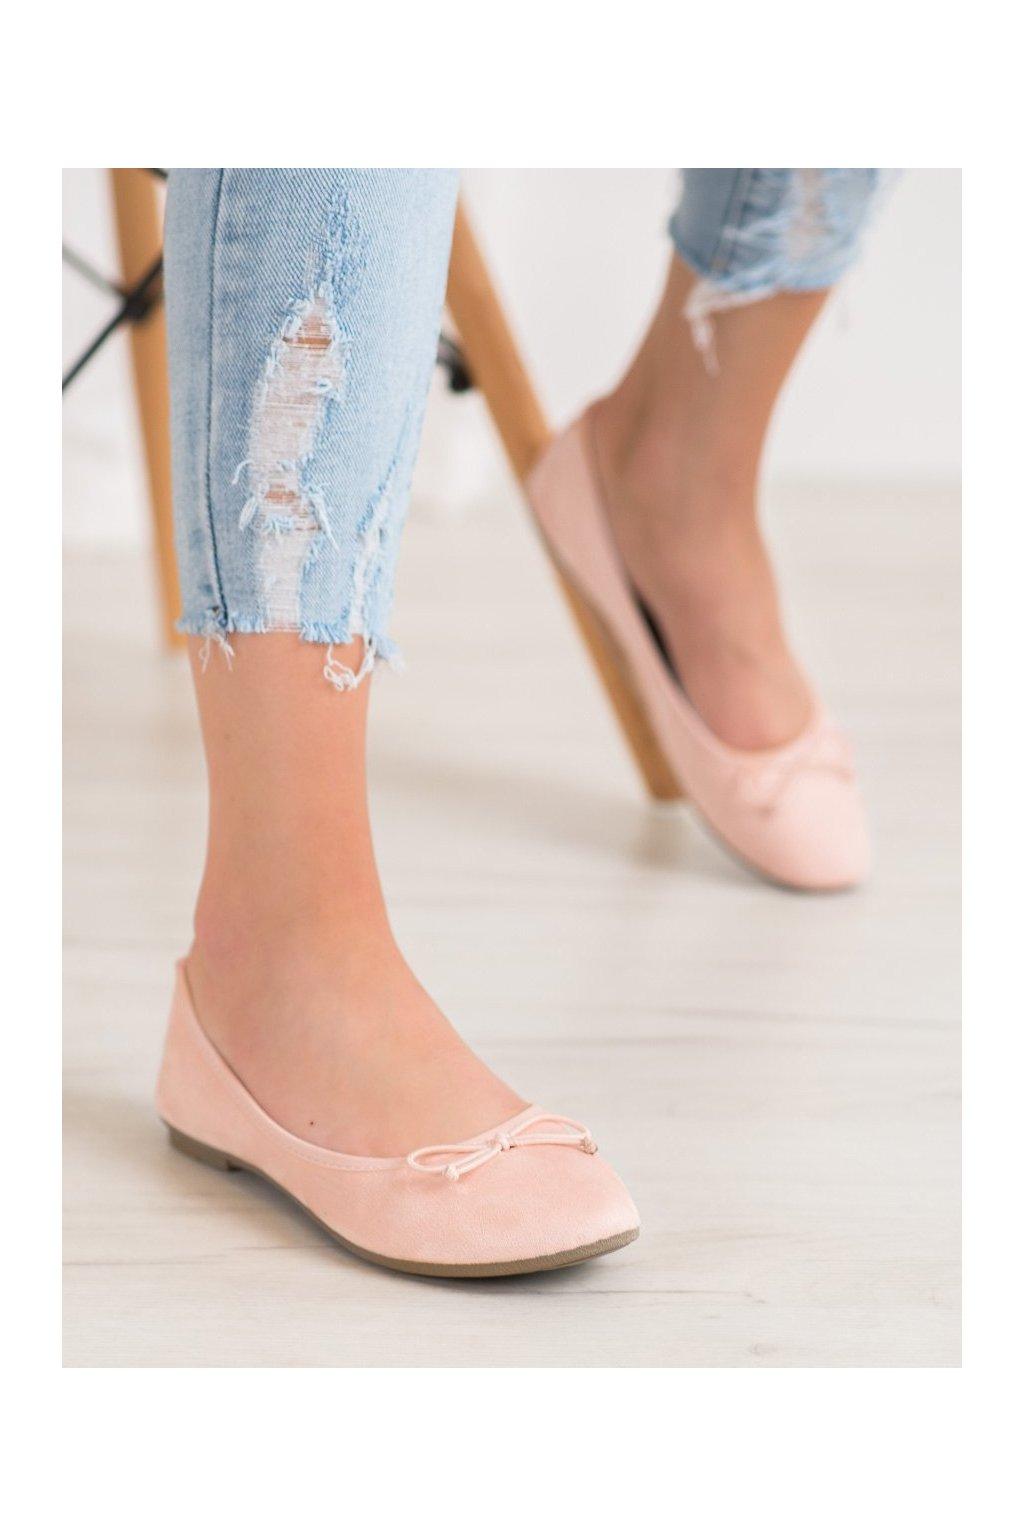 Ružové dámske balerínky Diamantique kod 98-32NU